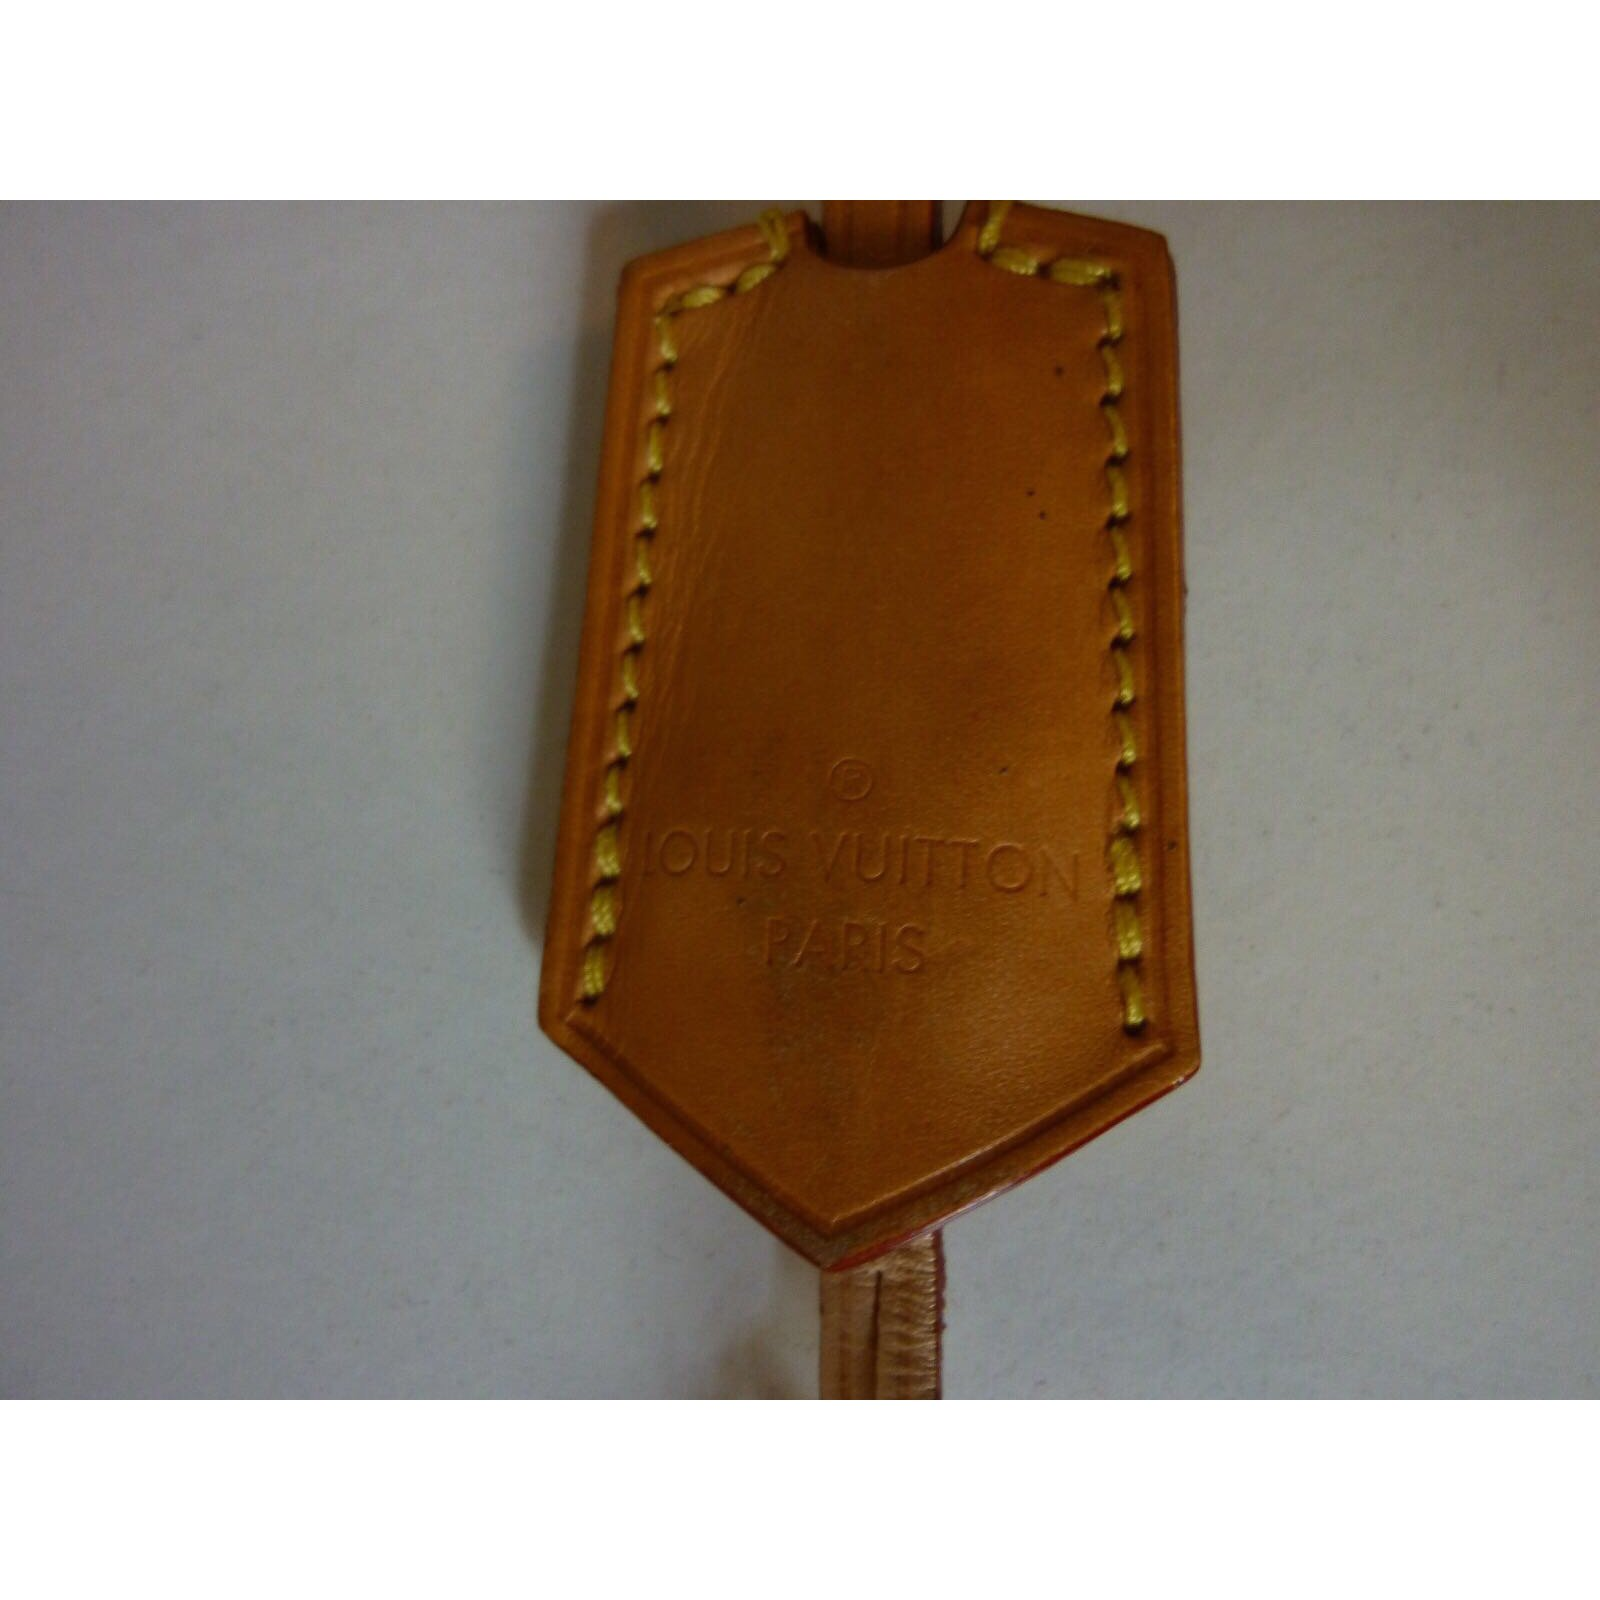 Sacs main louis vuitton sac deauville s rie ultra limit e en tuffetage cuir marron rouge ref - Teinter du cuir ...